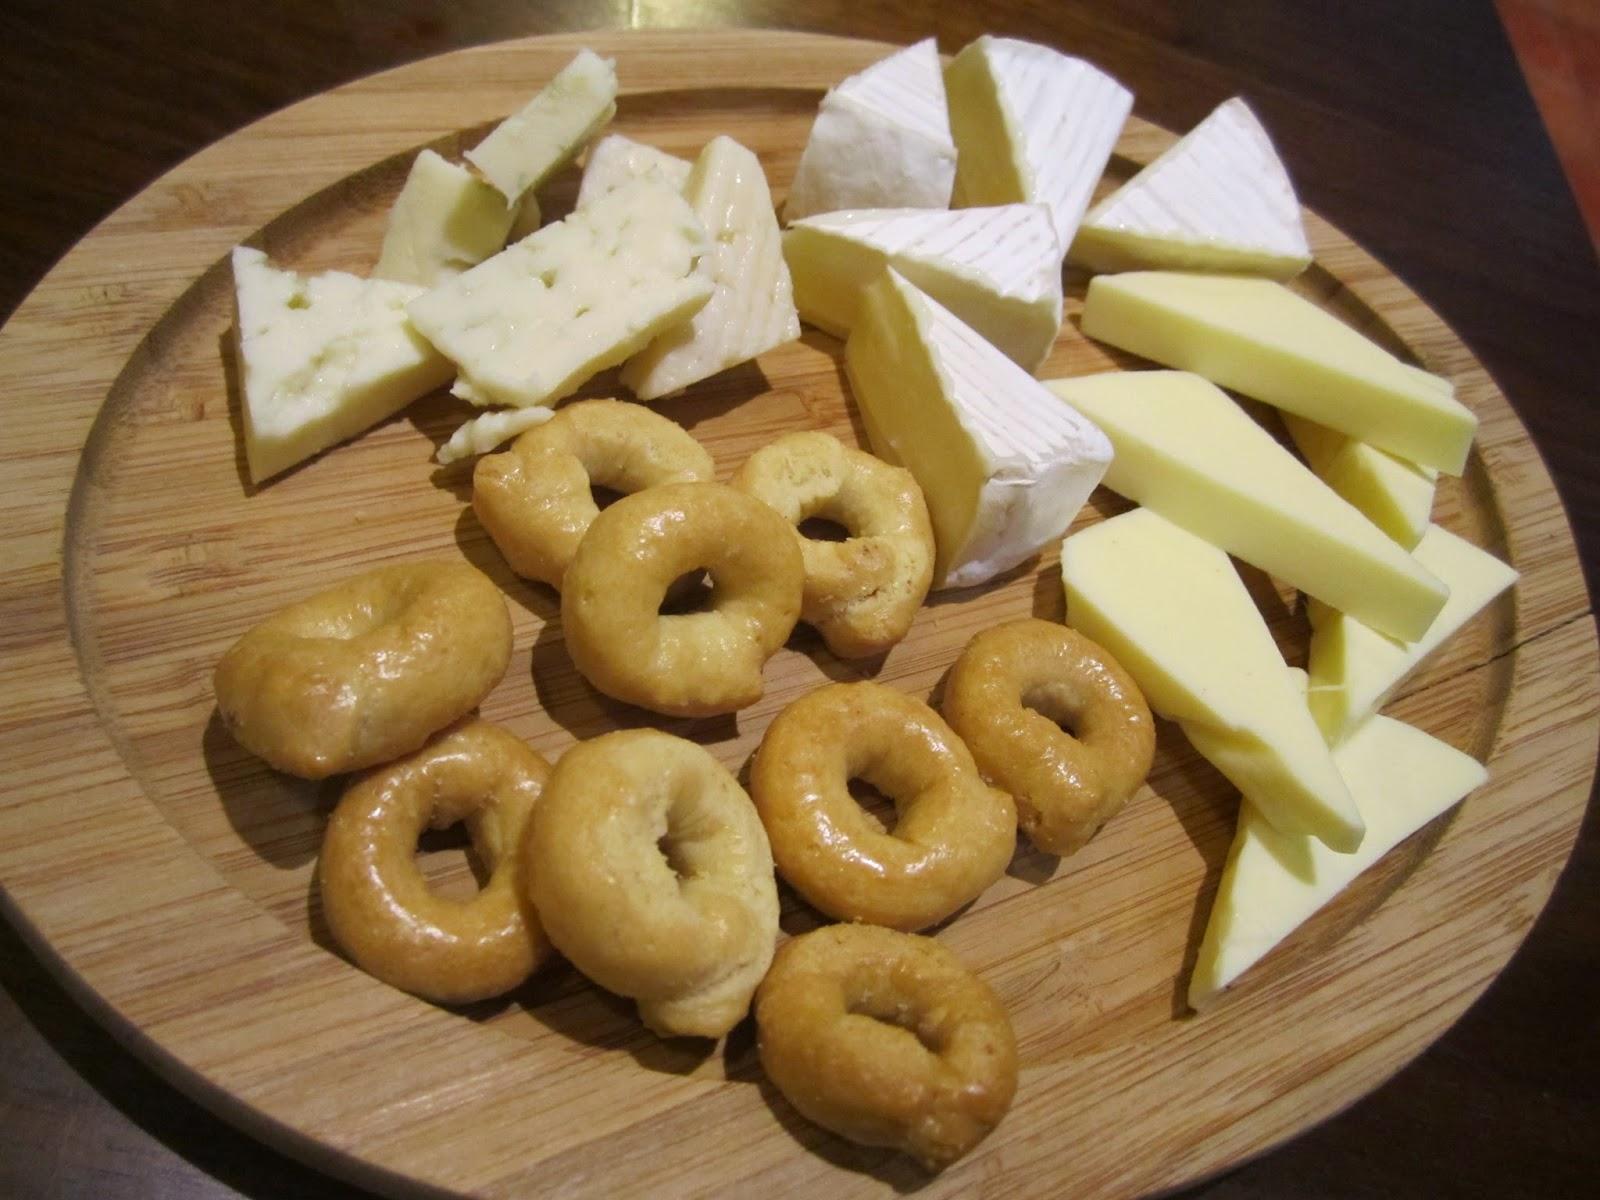 3 Variety Cheese Plate Sette Colore Towada Italian Bar 3種チーズの盛り合わせ セッテコローレ イタリアンバー 十和田市